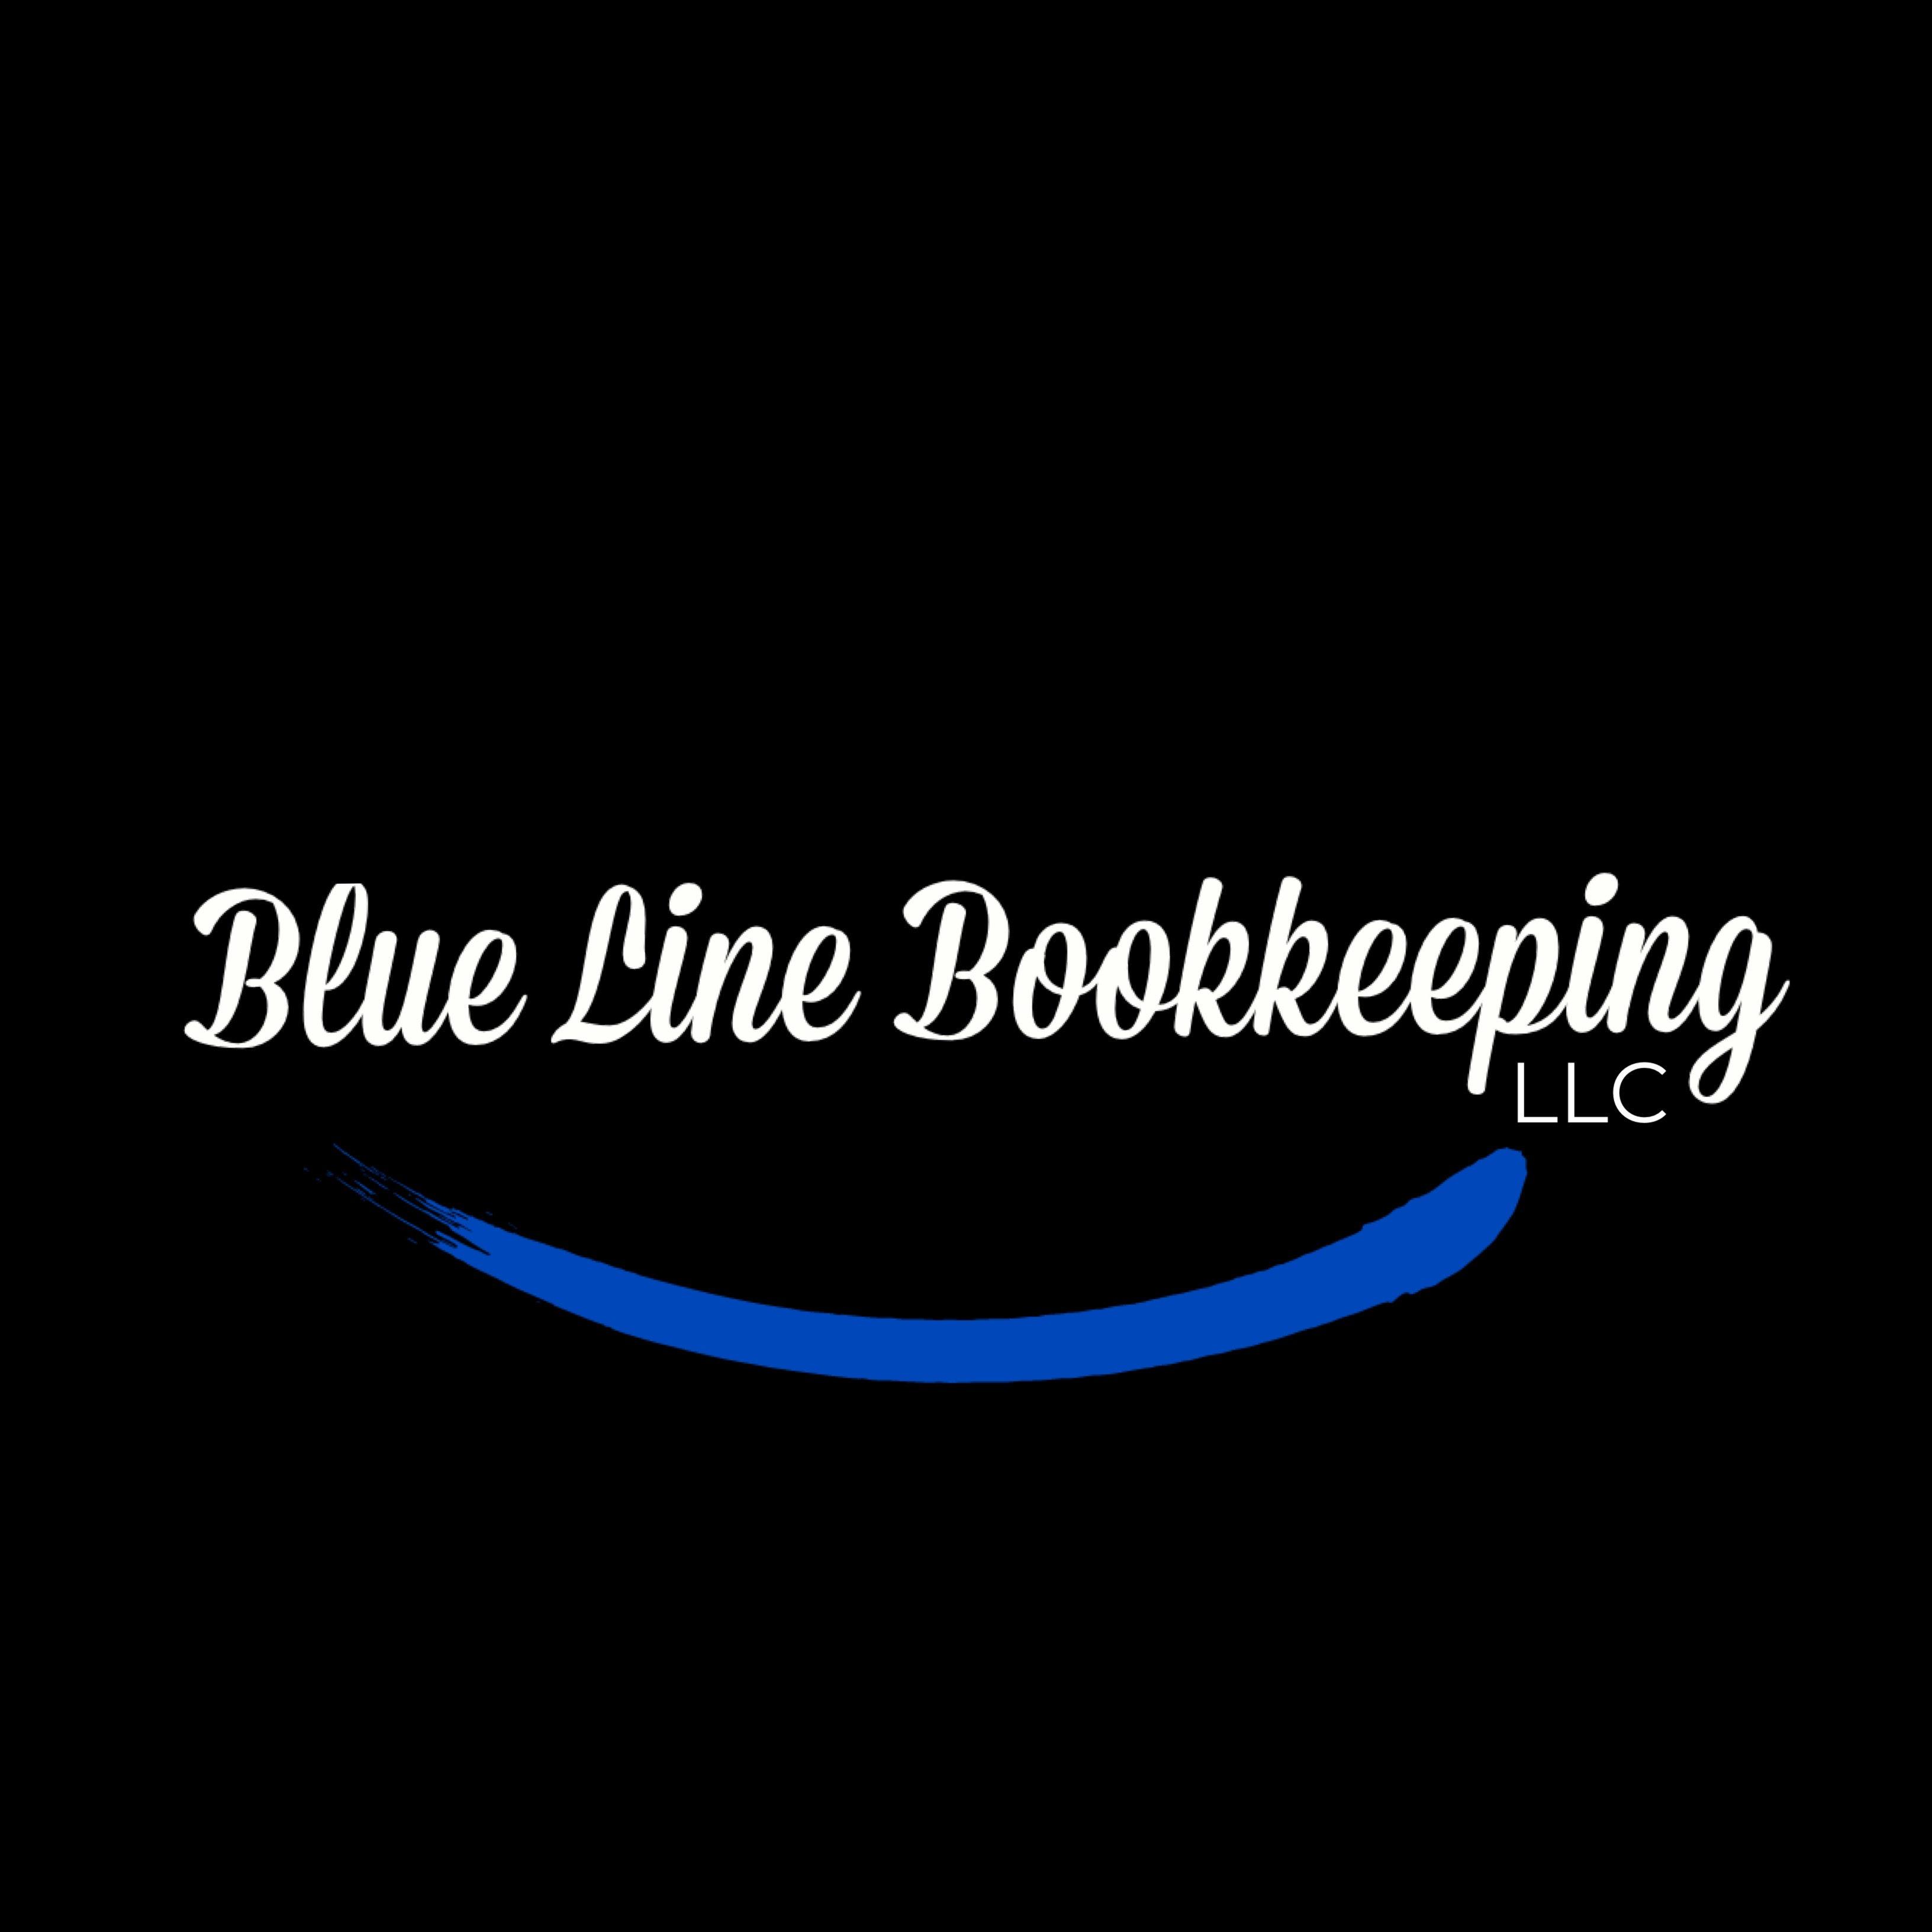 Blue Line Bookkeeping LLC